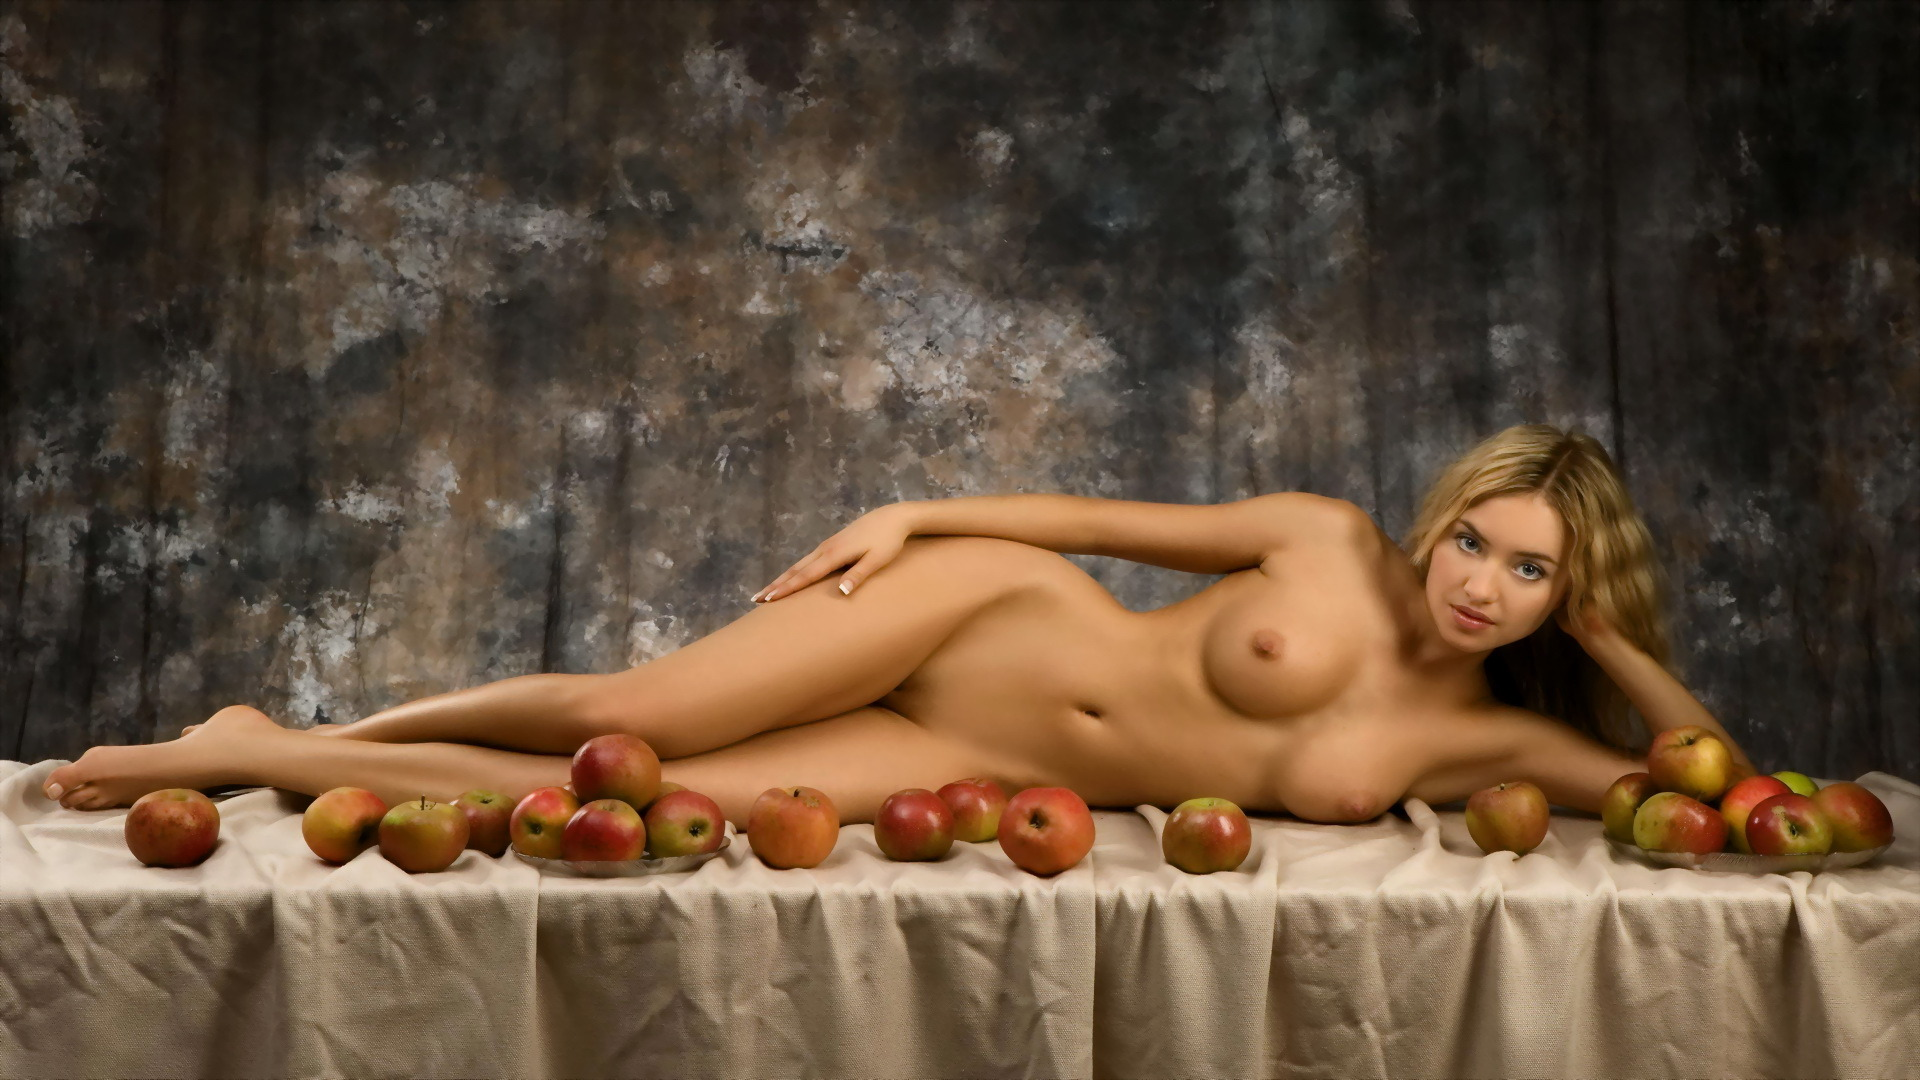 Girl nude erotic